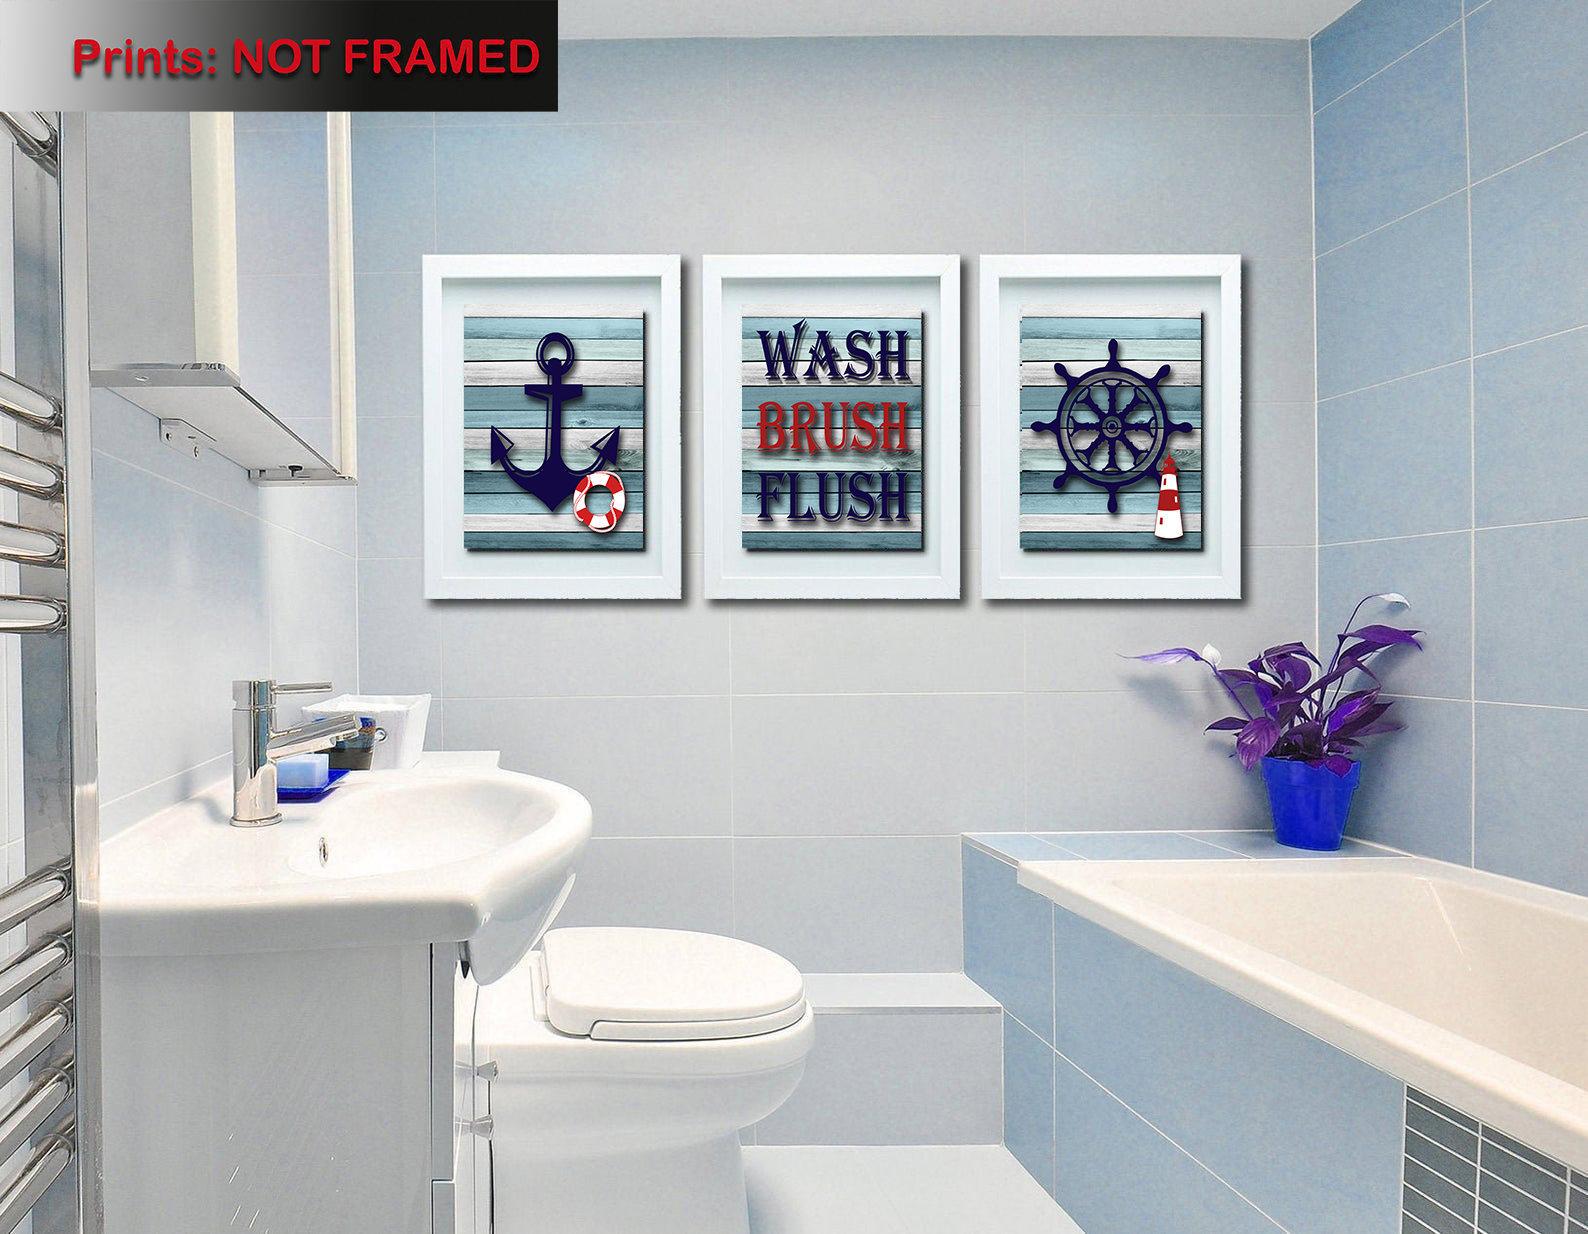 Wash Brush Flush Lakehouse Decor, Lake House Bathroom Wall Decor